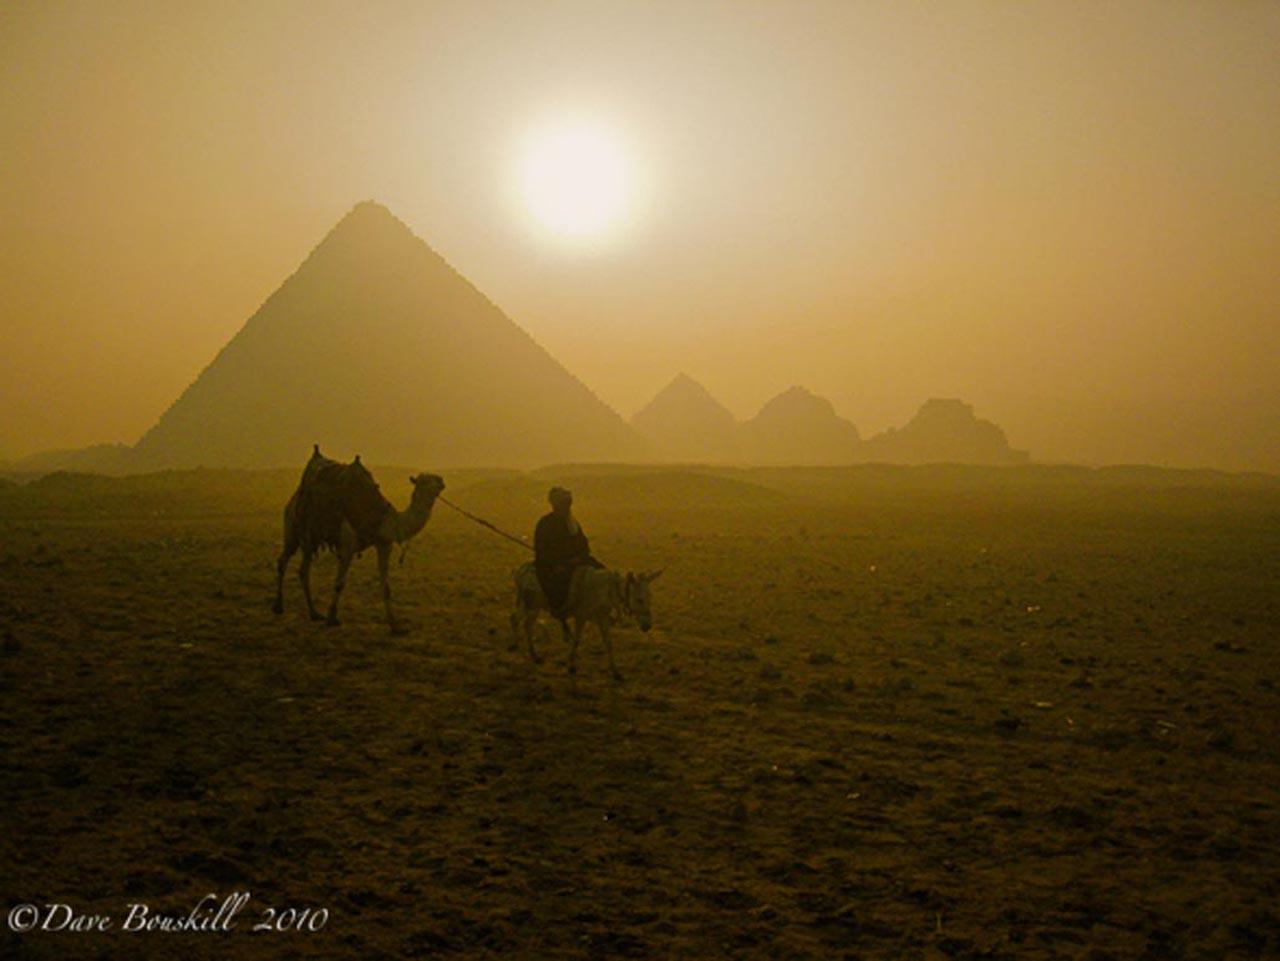 pyramids at sunrise